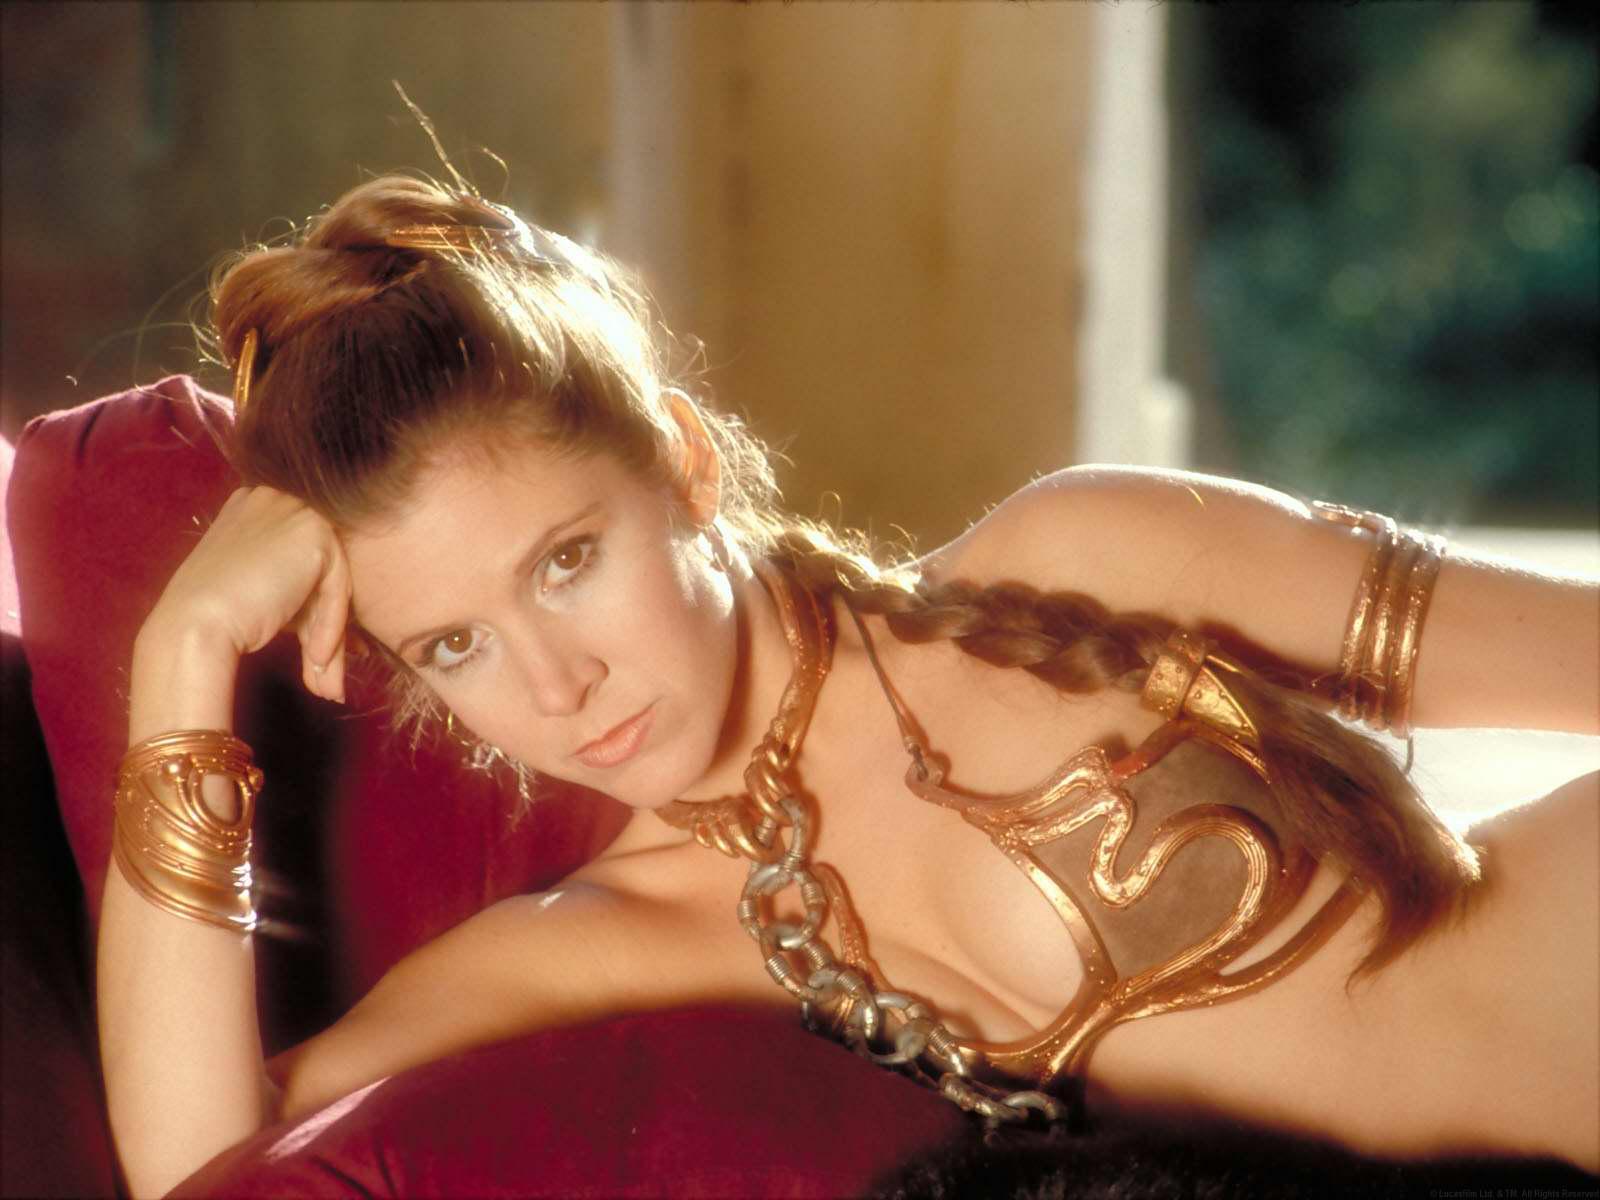 Princess leia bikini scene